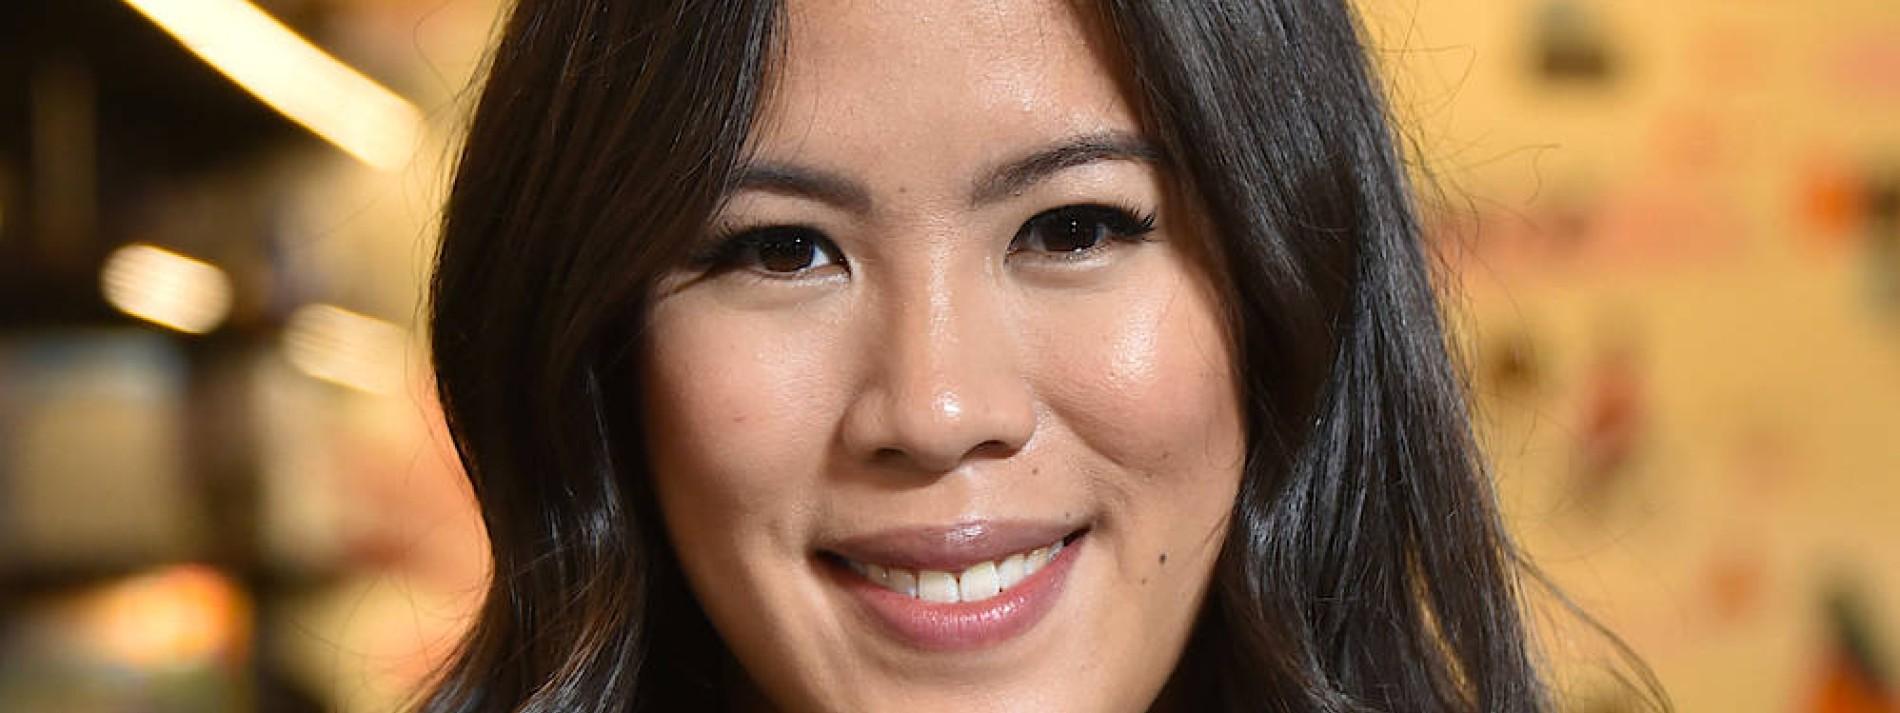 Warum Mai Thi Nguyen-Kim zum ZDF kommt